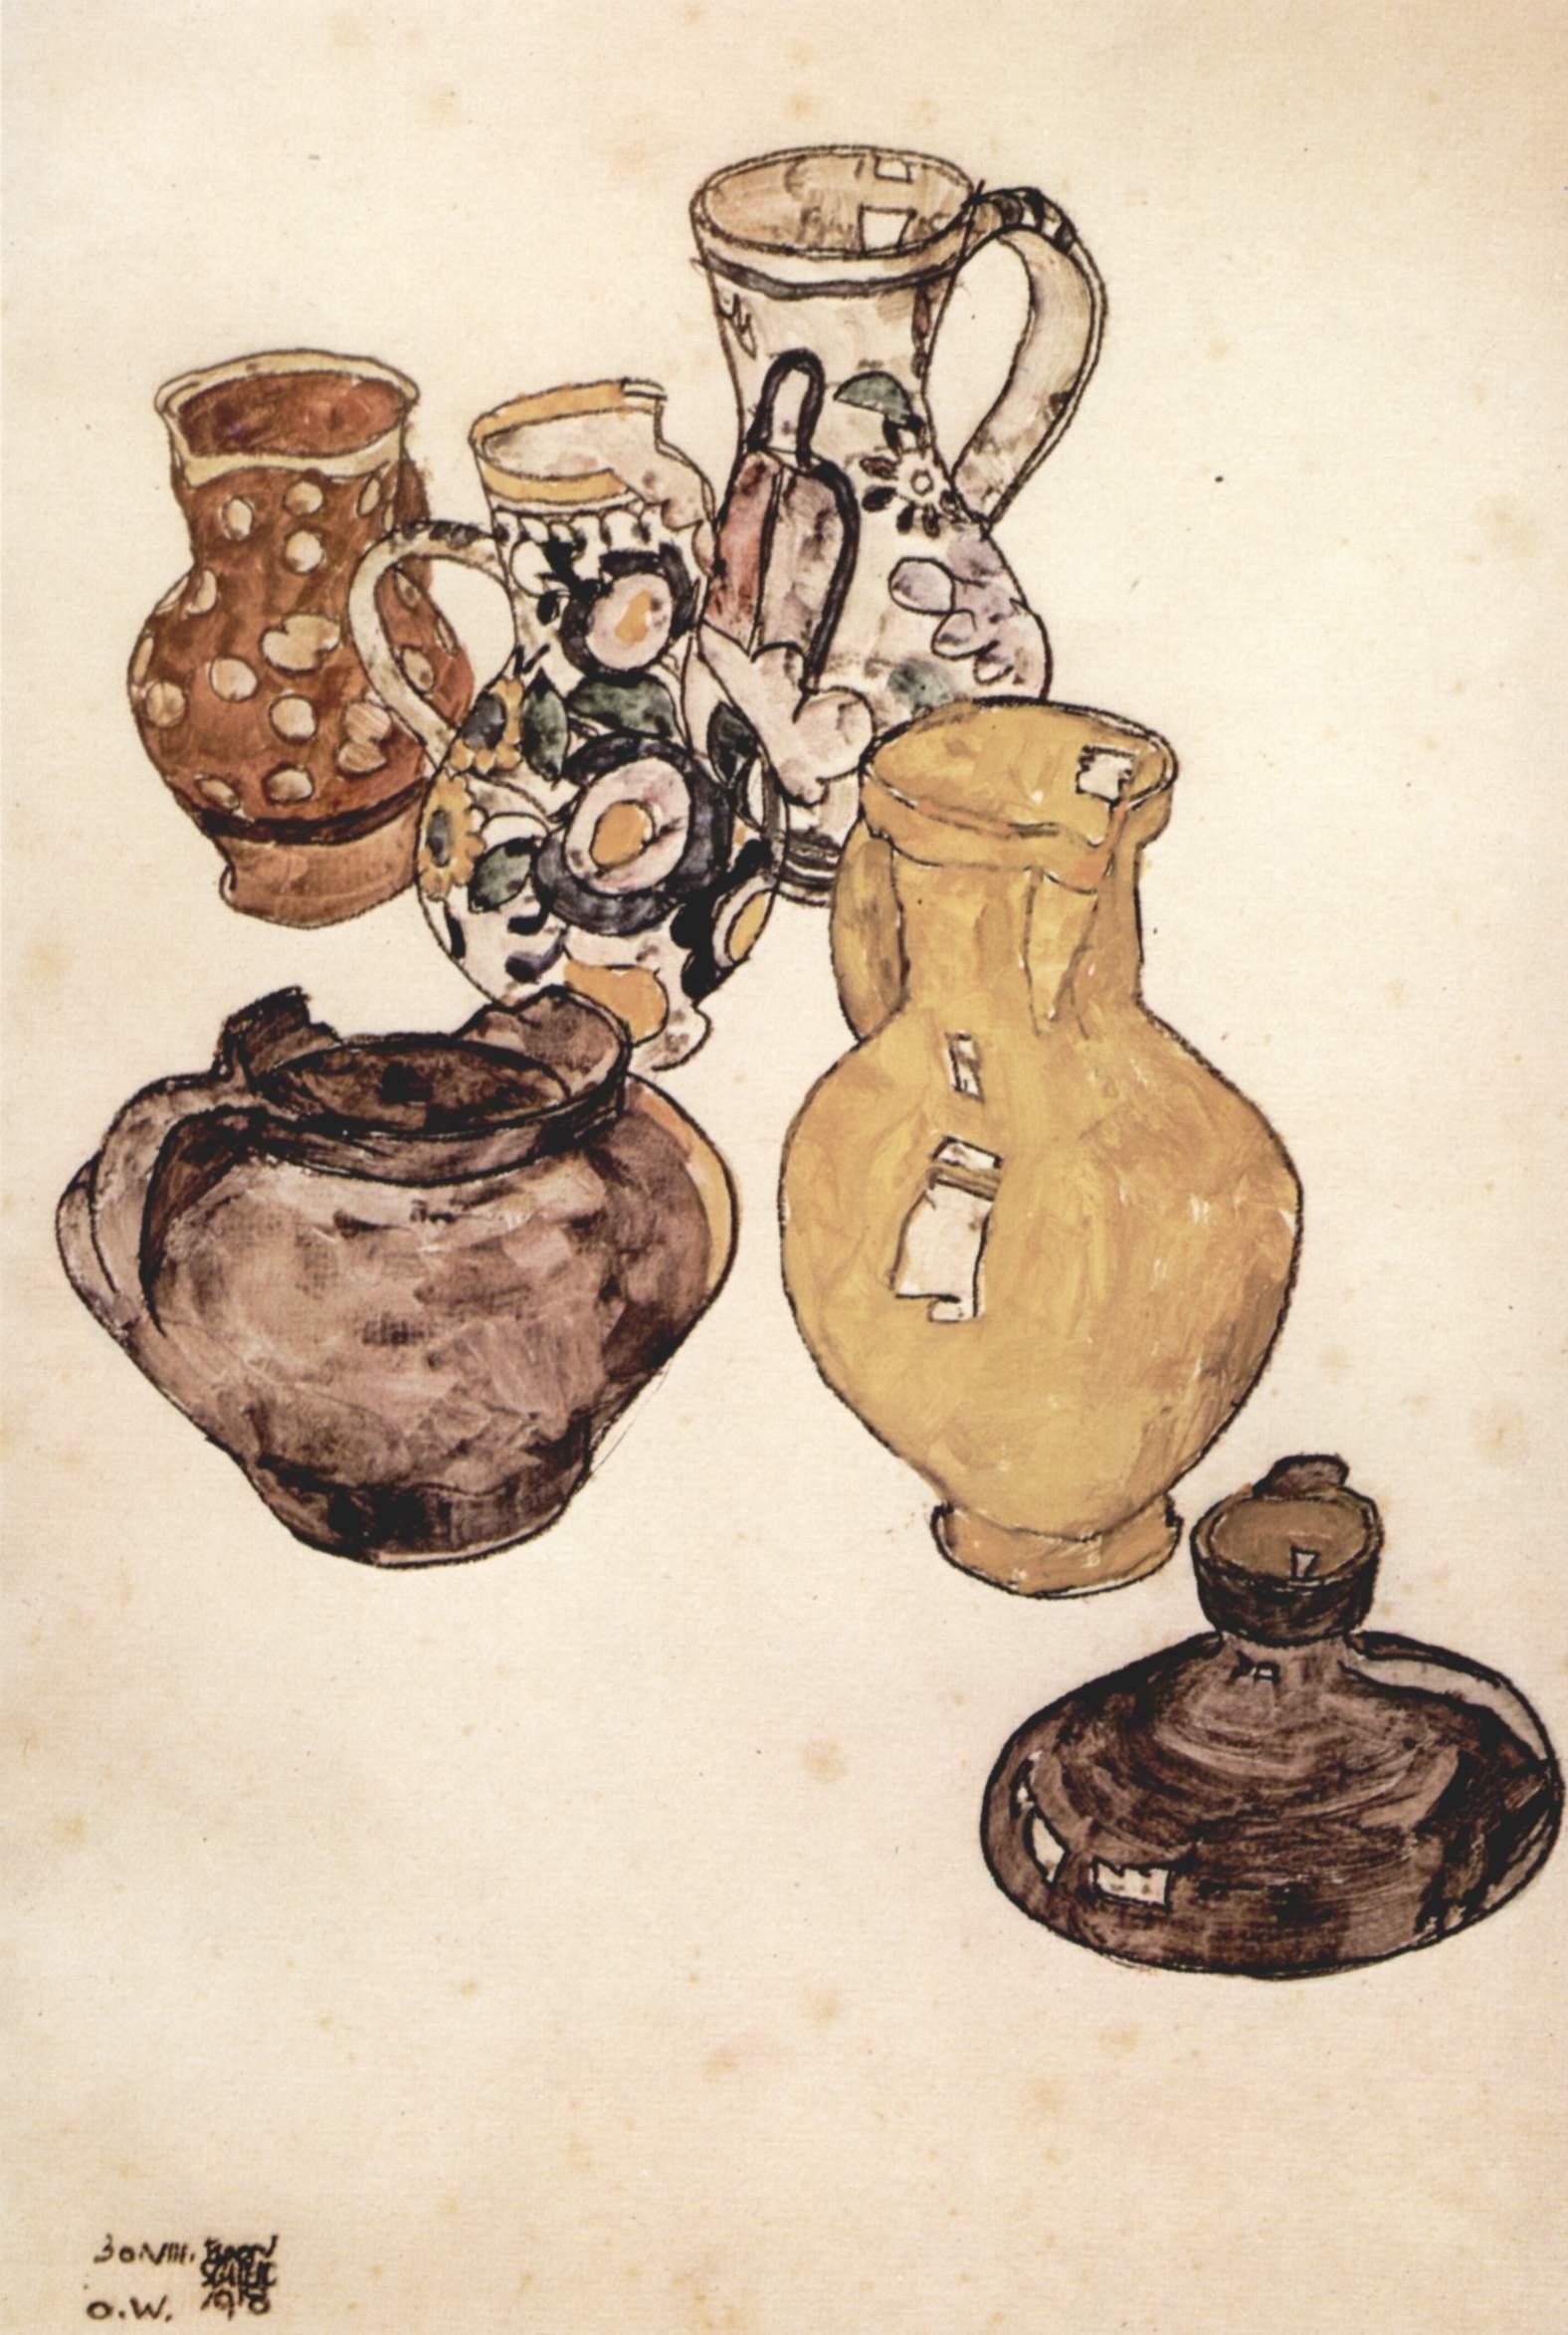 Egon_Schiele_Натюрморт 1918